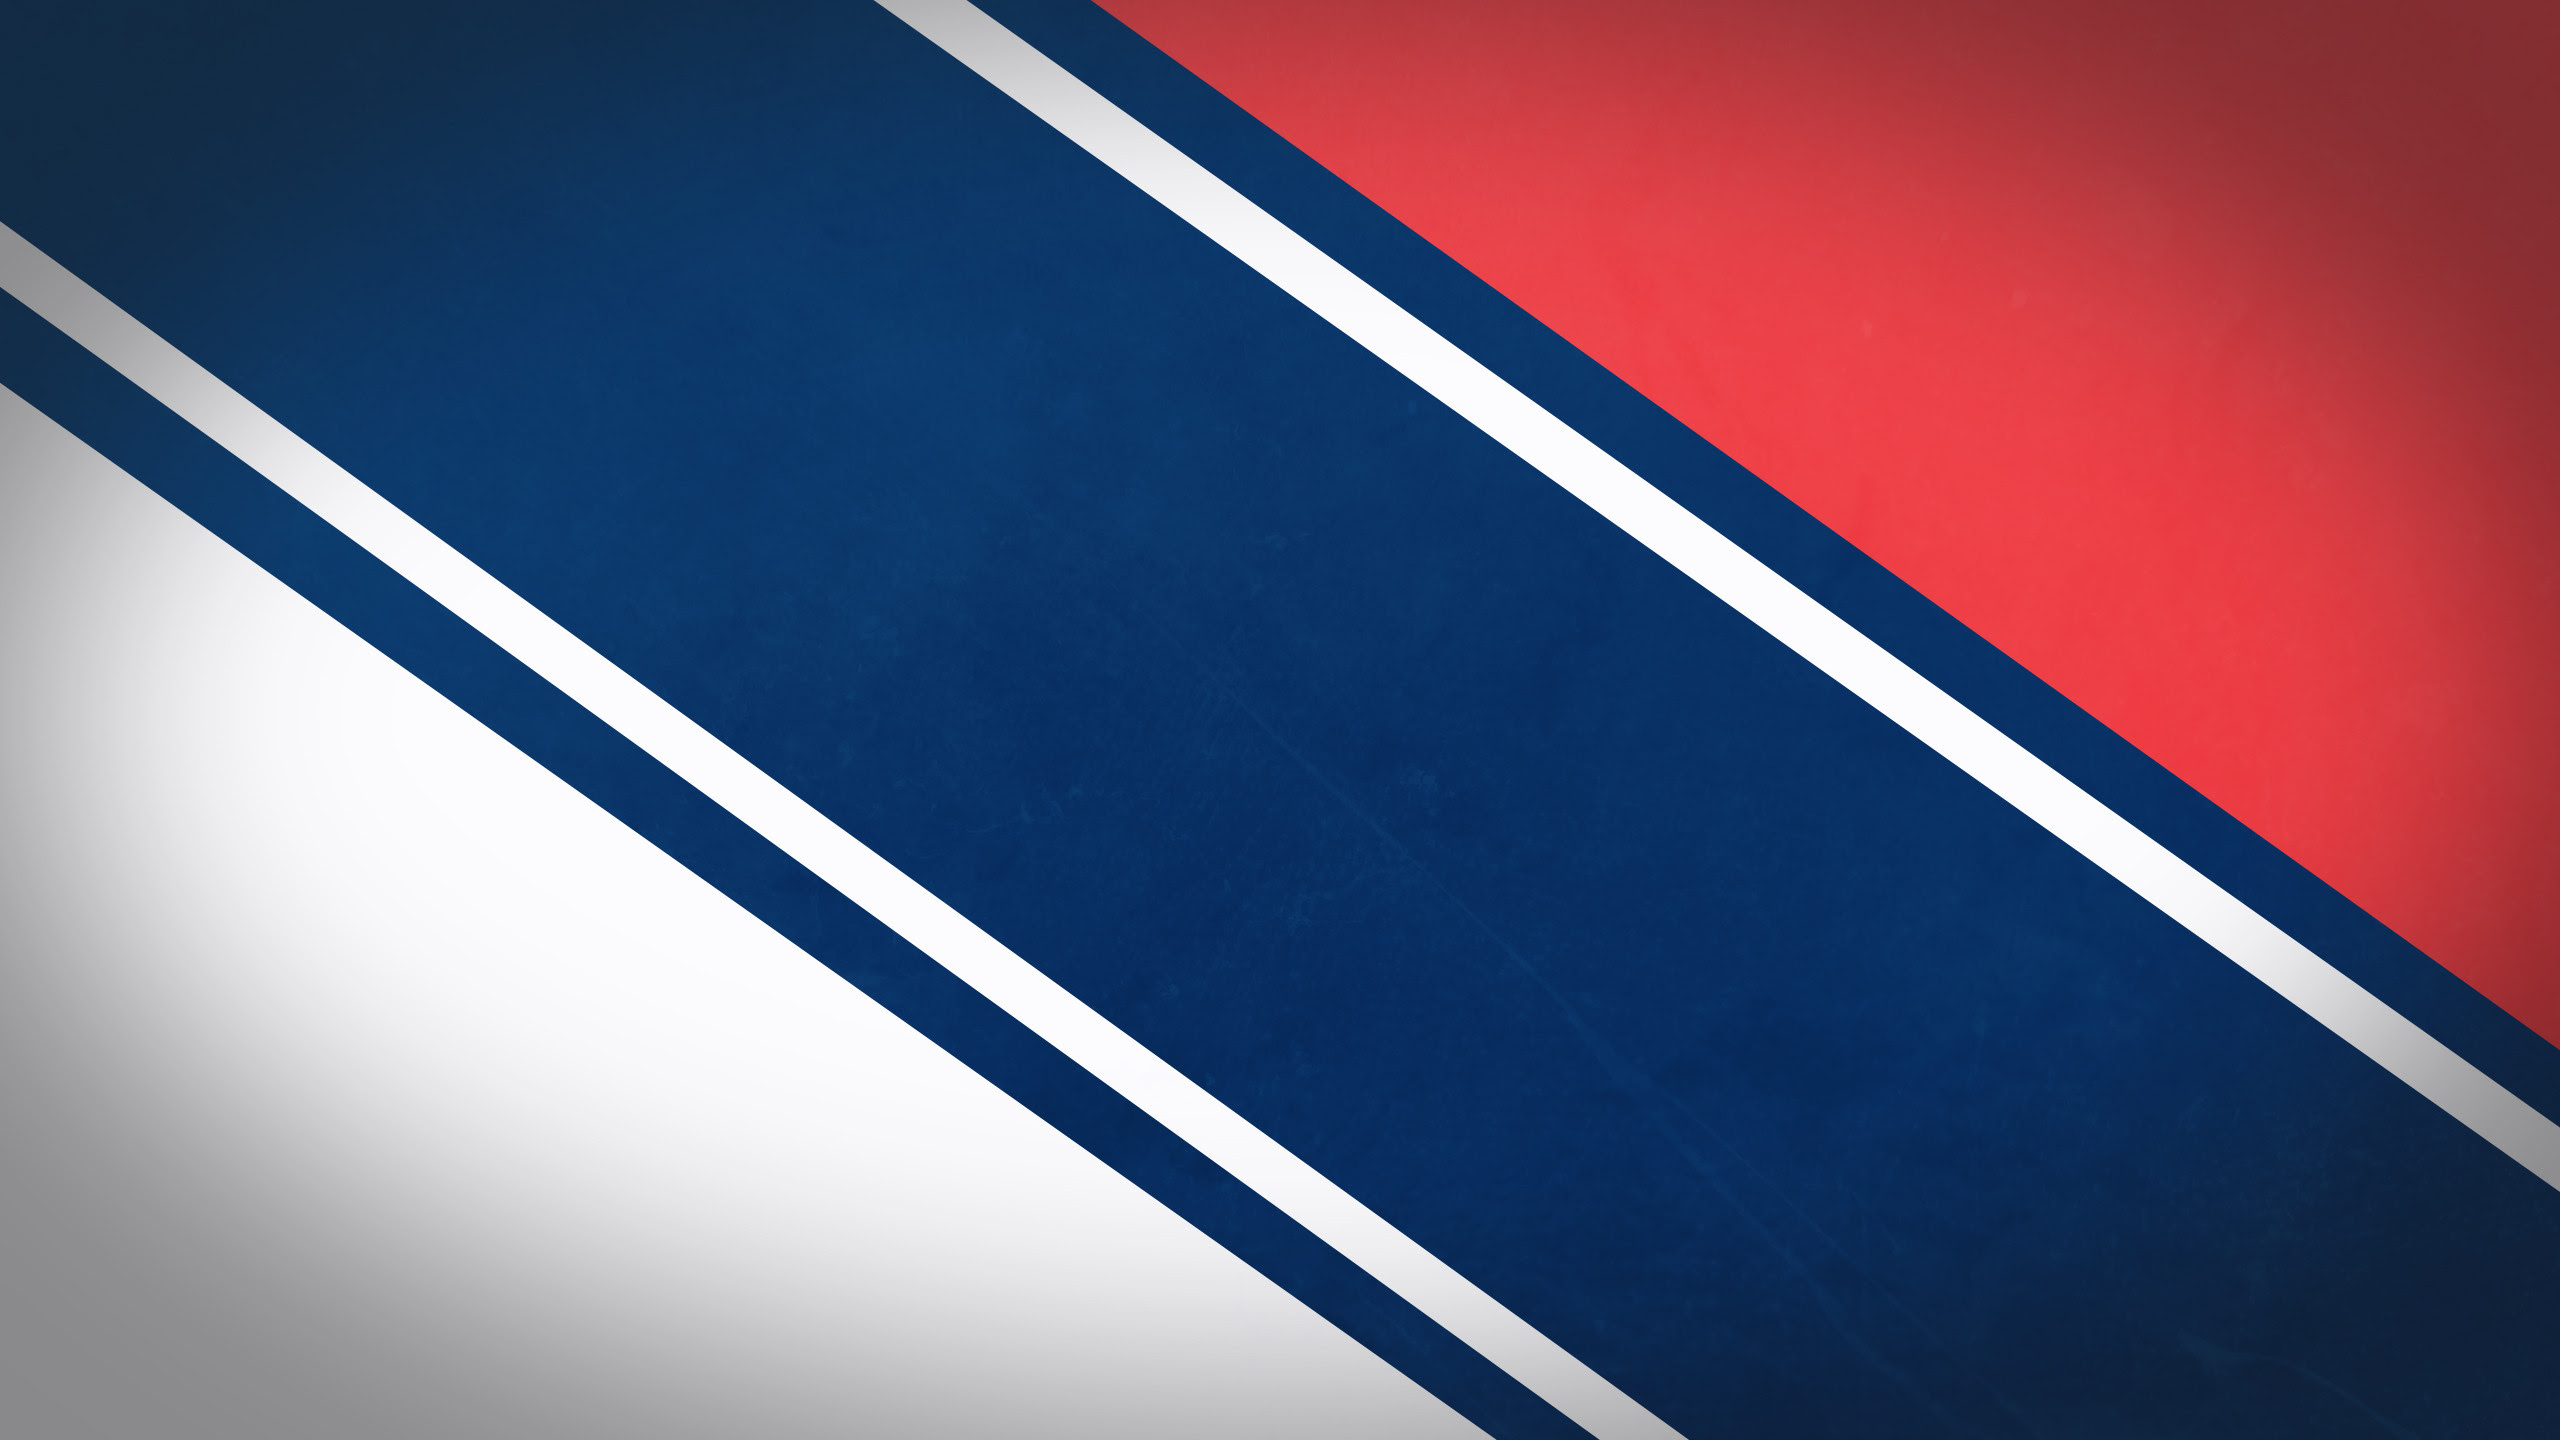 New York Rangers Wallpaper 2560x1440 54076